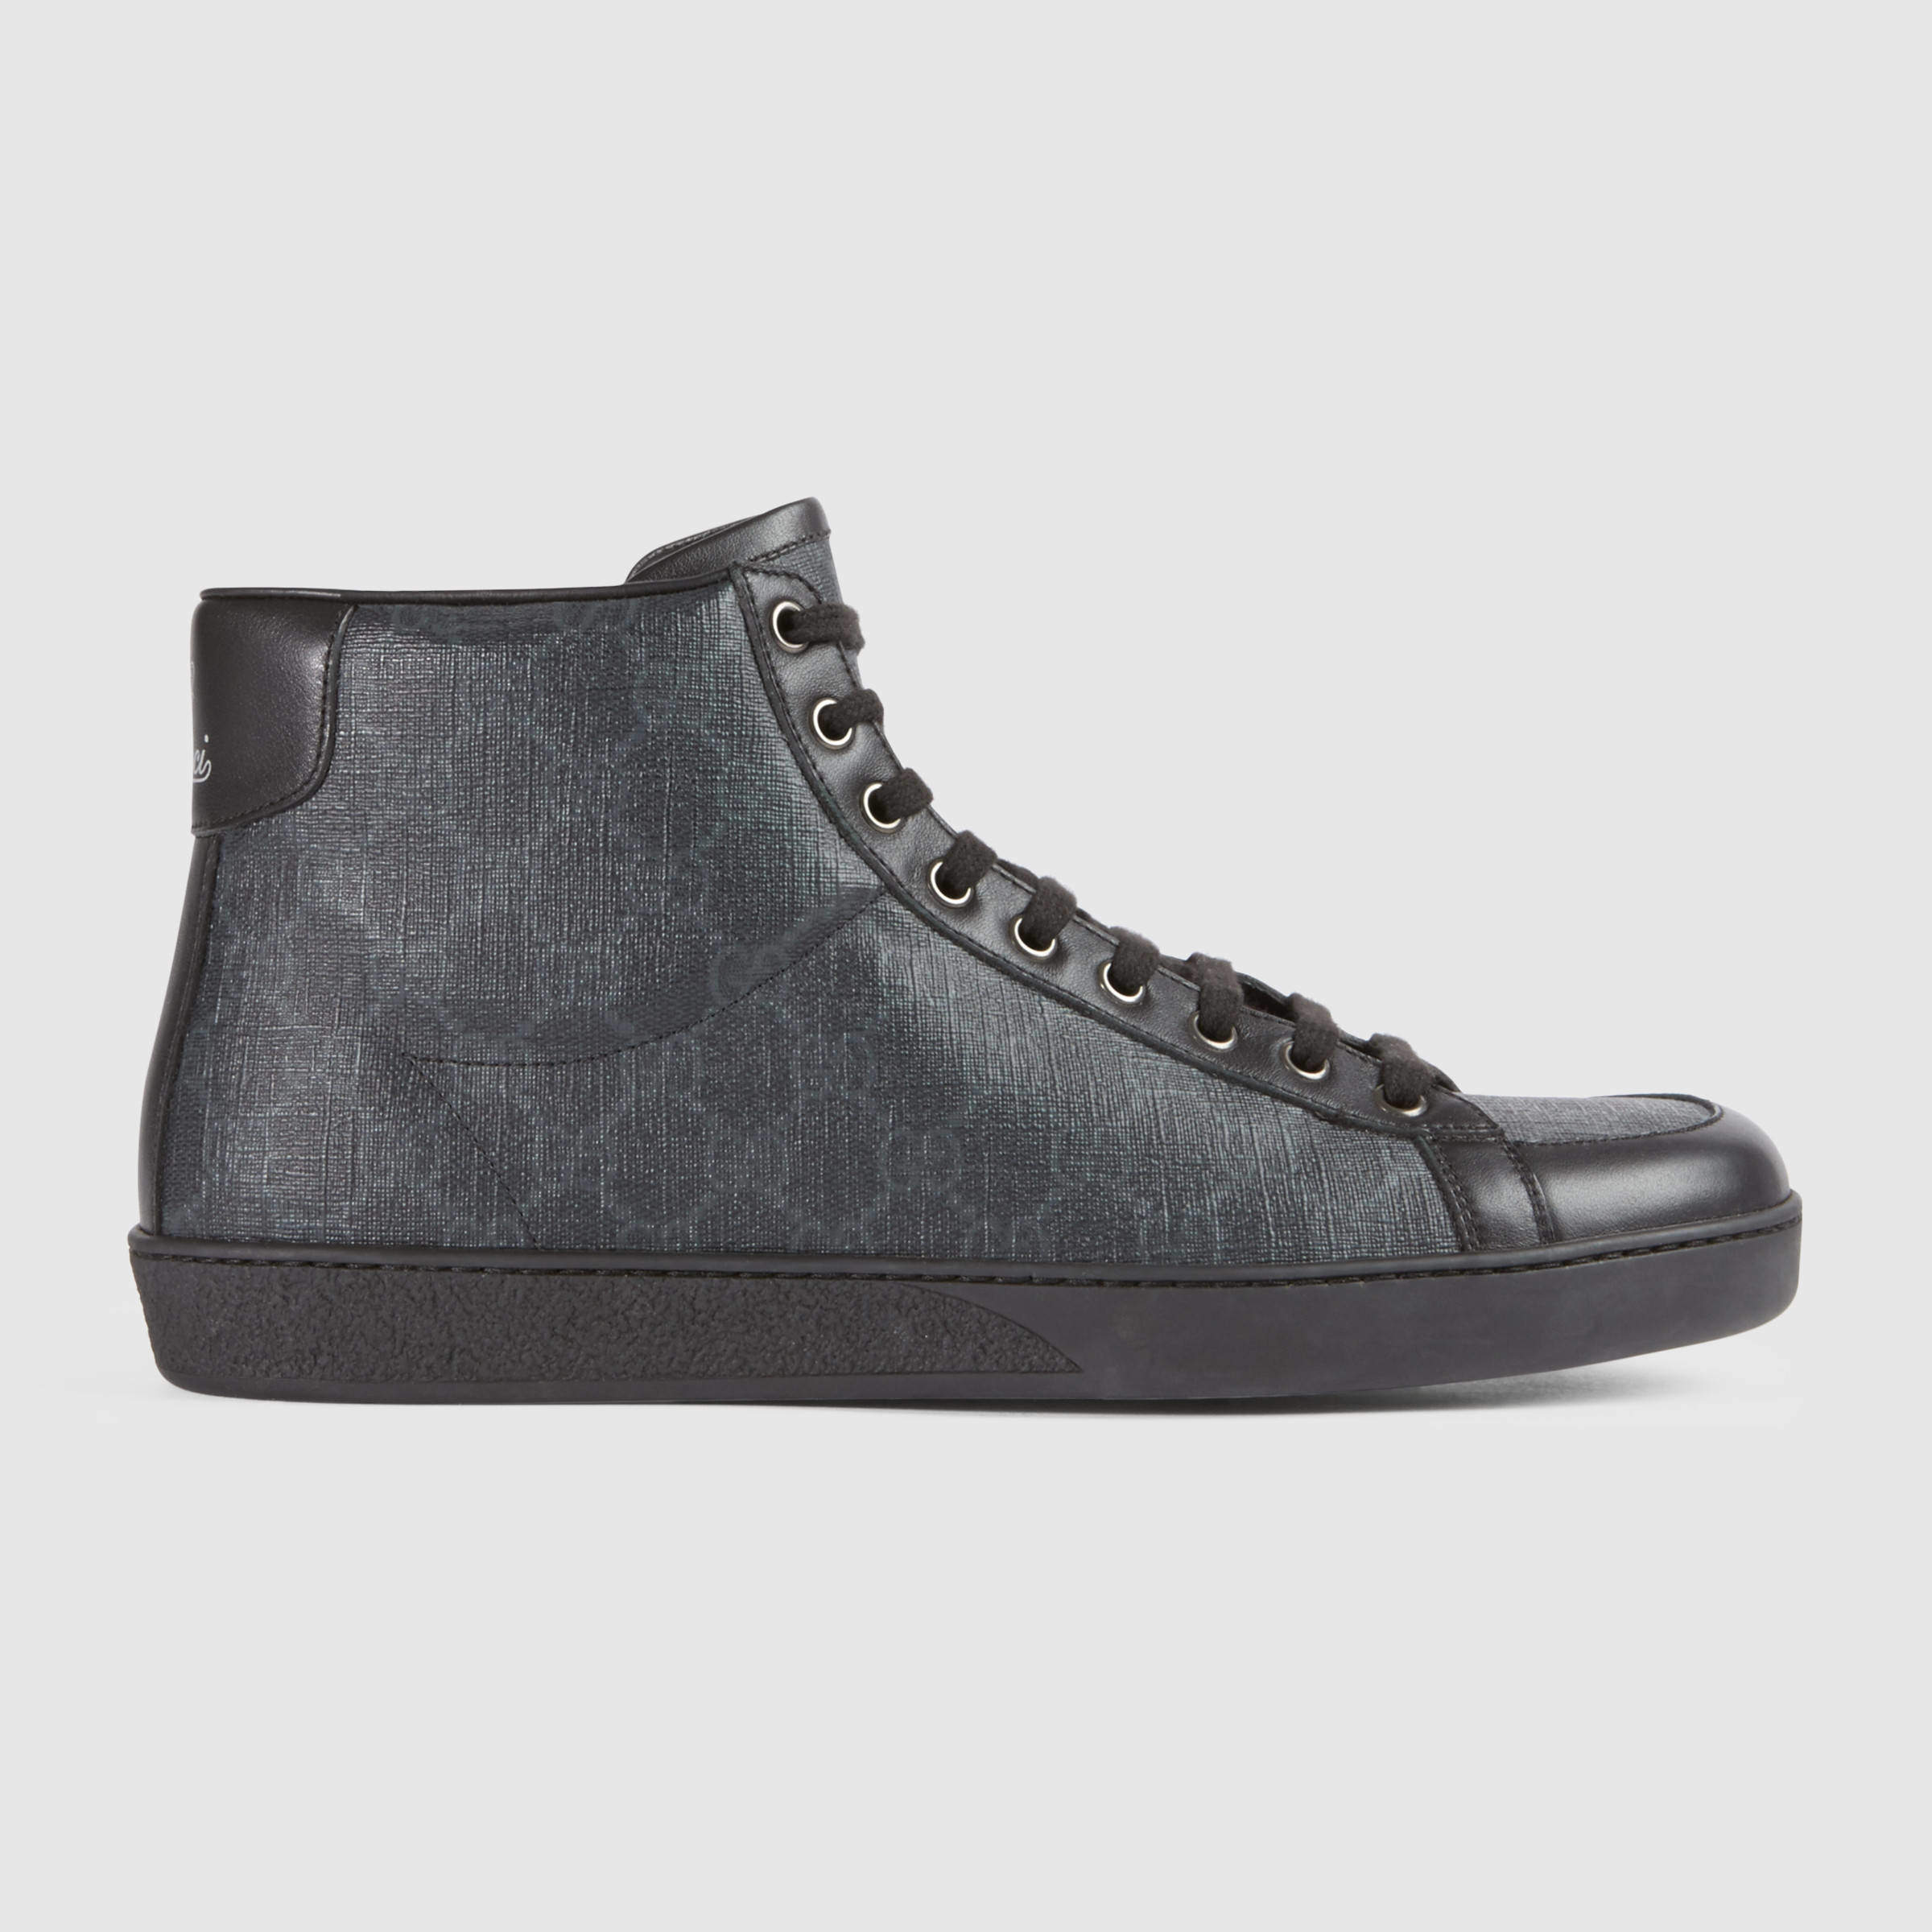 e9404c891 Gucci Gg Supreme High-top Sneaker in Gray for Men - Lyst